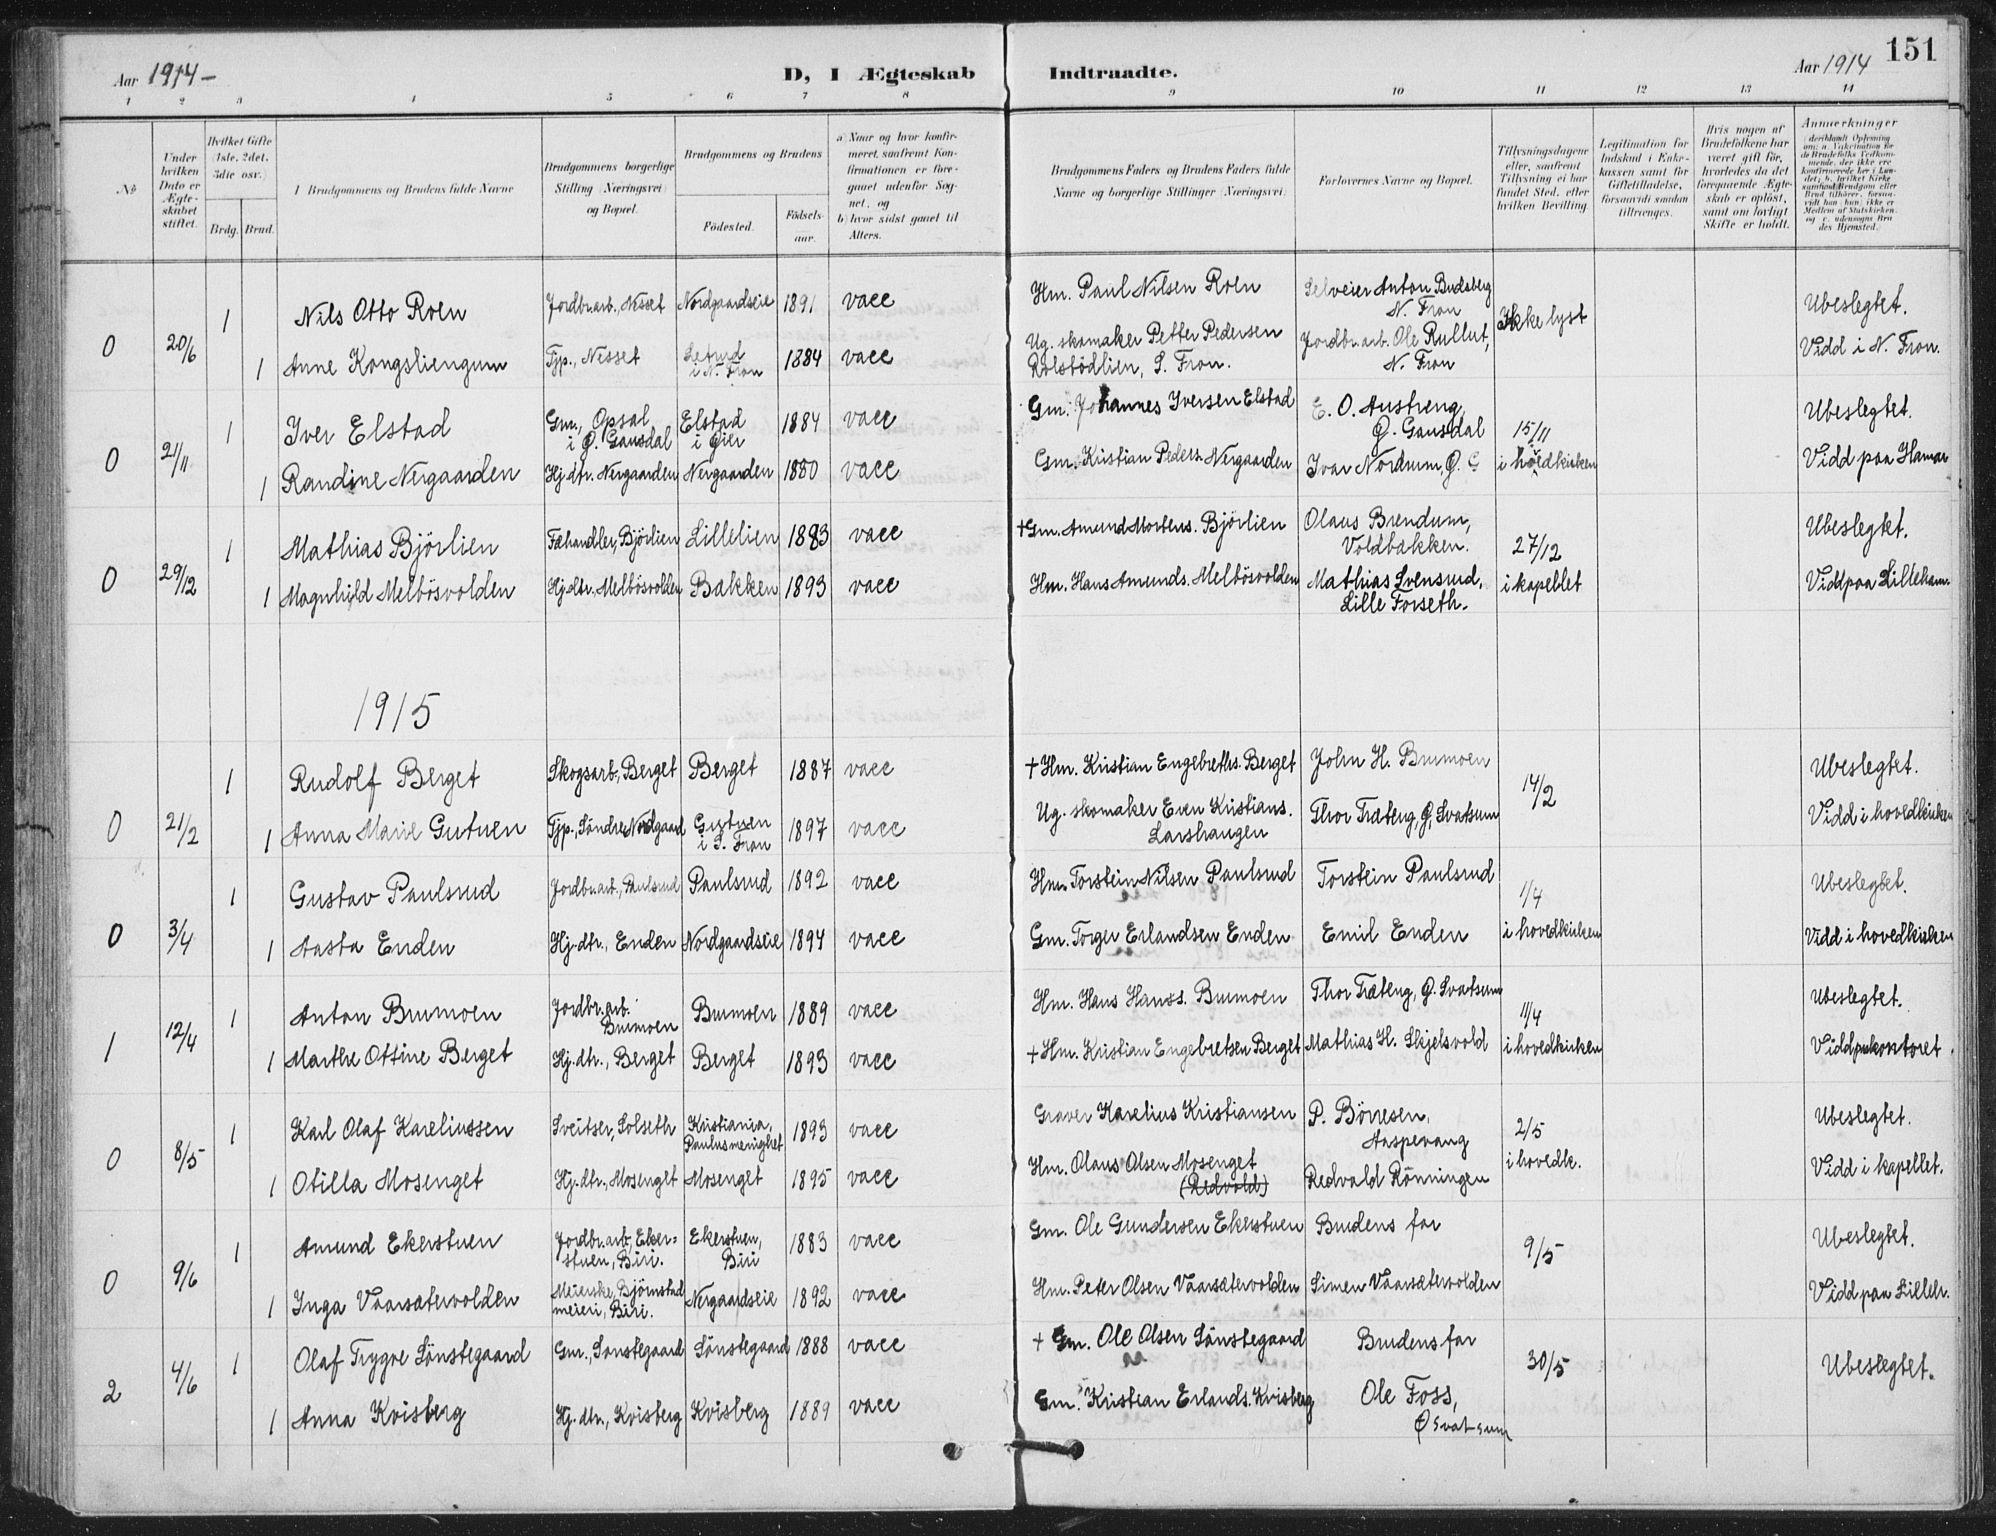 SAH, Vestre Gausdal prestekontor, Klokkerbok nr. 4, 1898-1939, s. 151